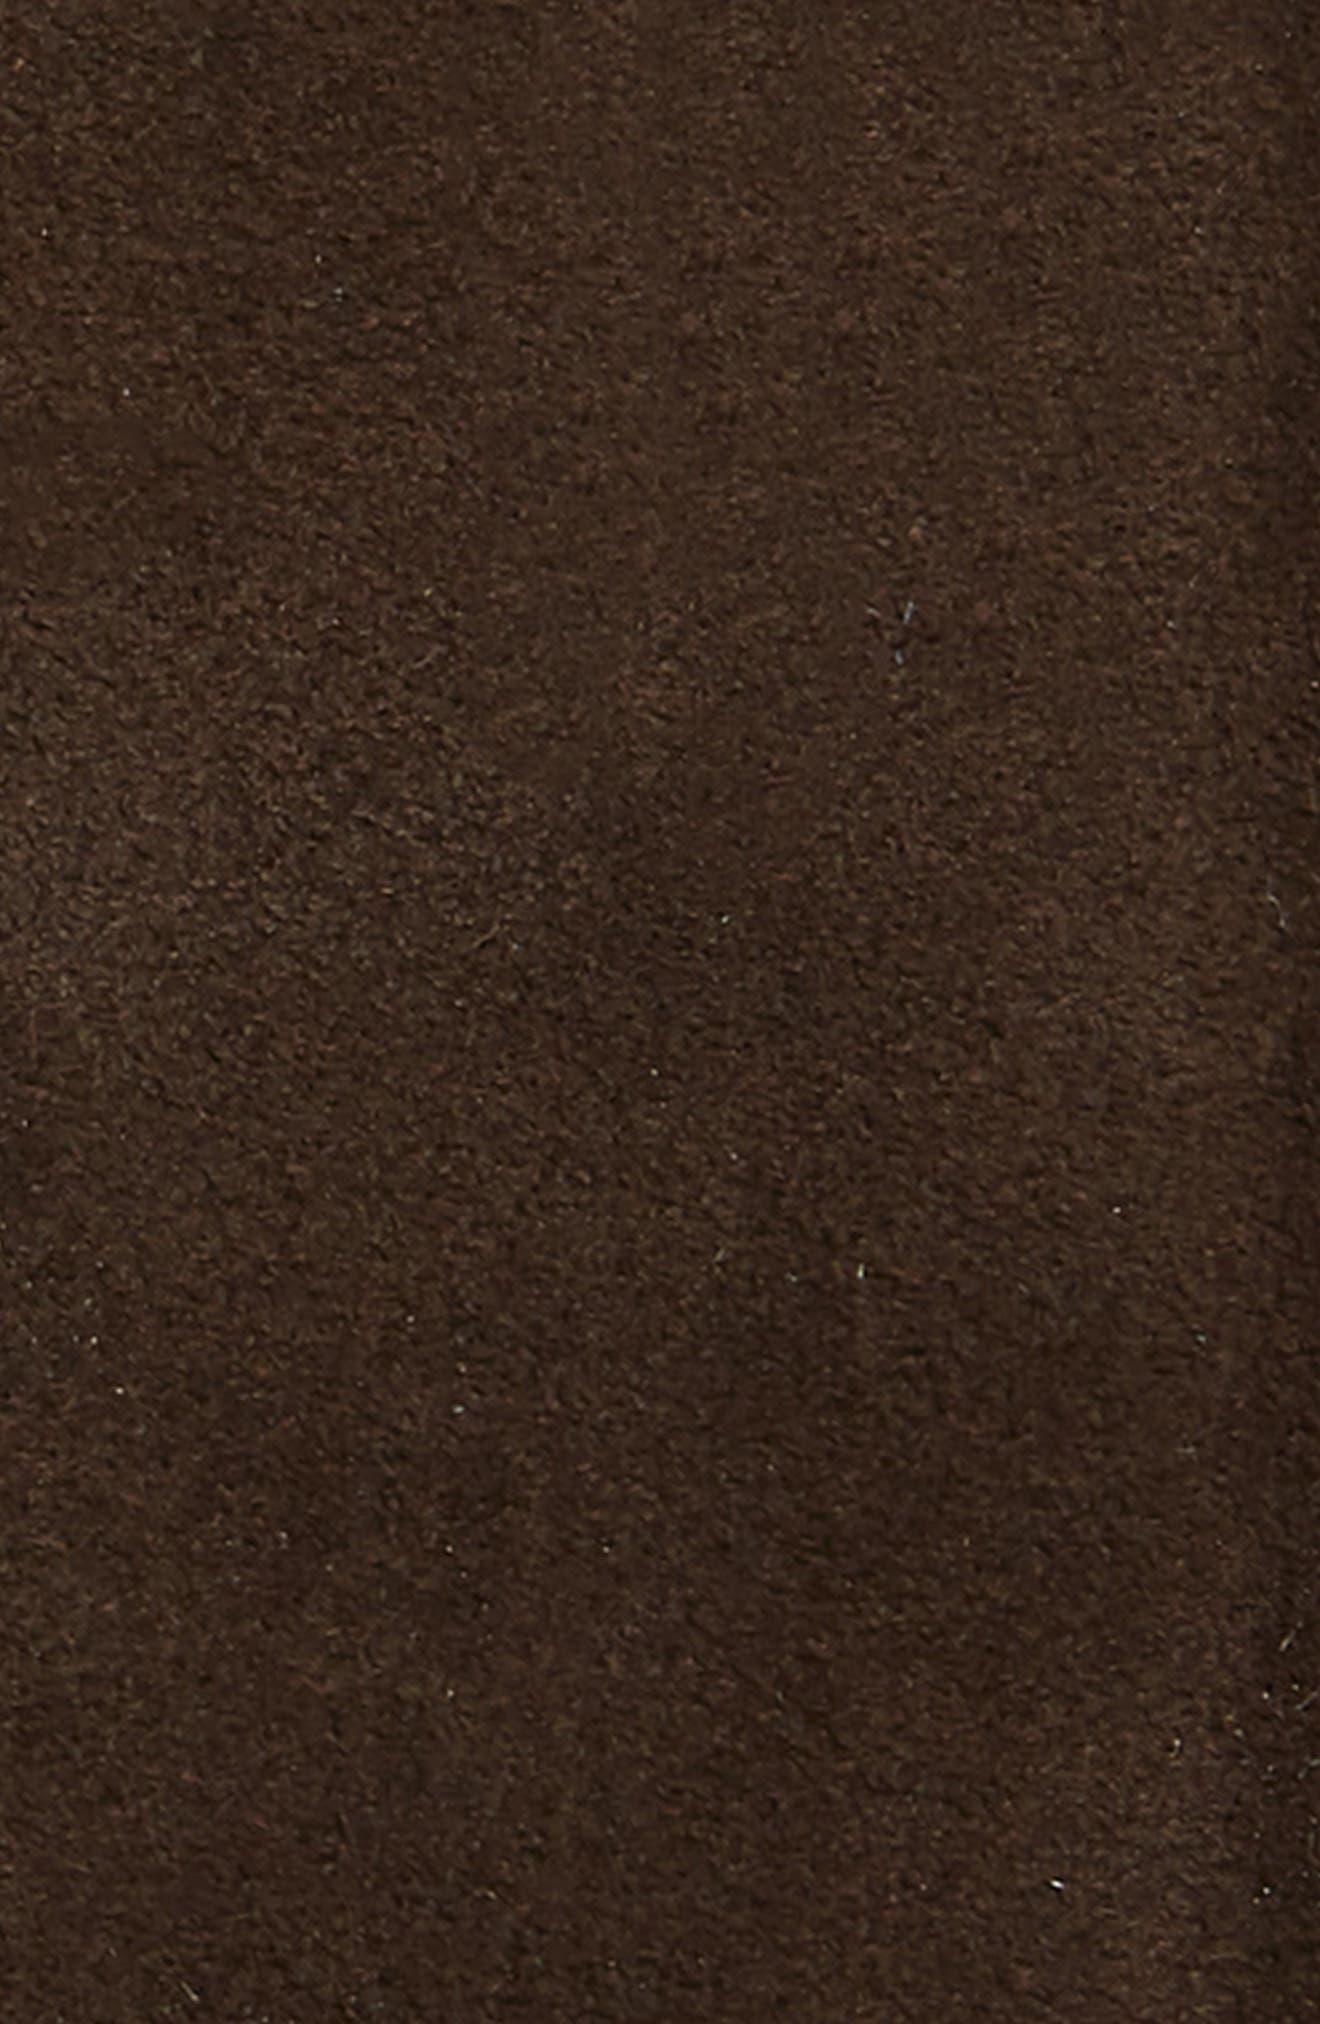 Suede Belt,                             Alternate thumbnail 2, color,                             SUEDE ALASKA DARK BROWN